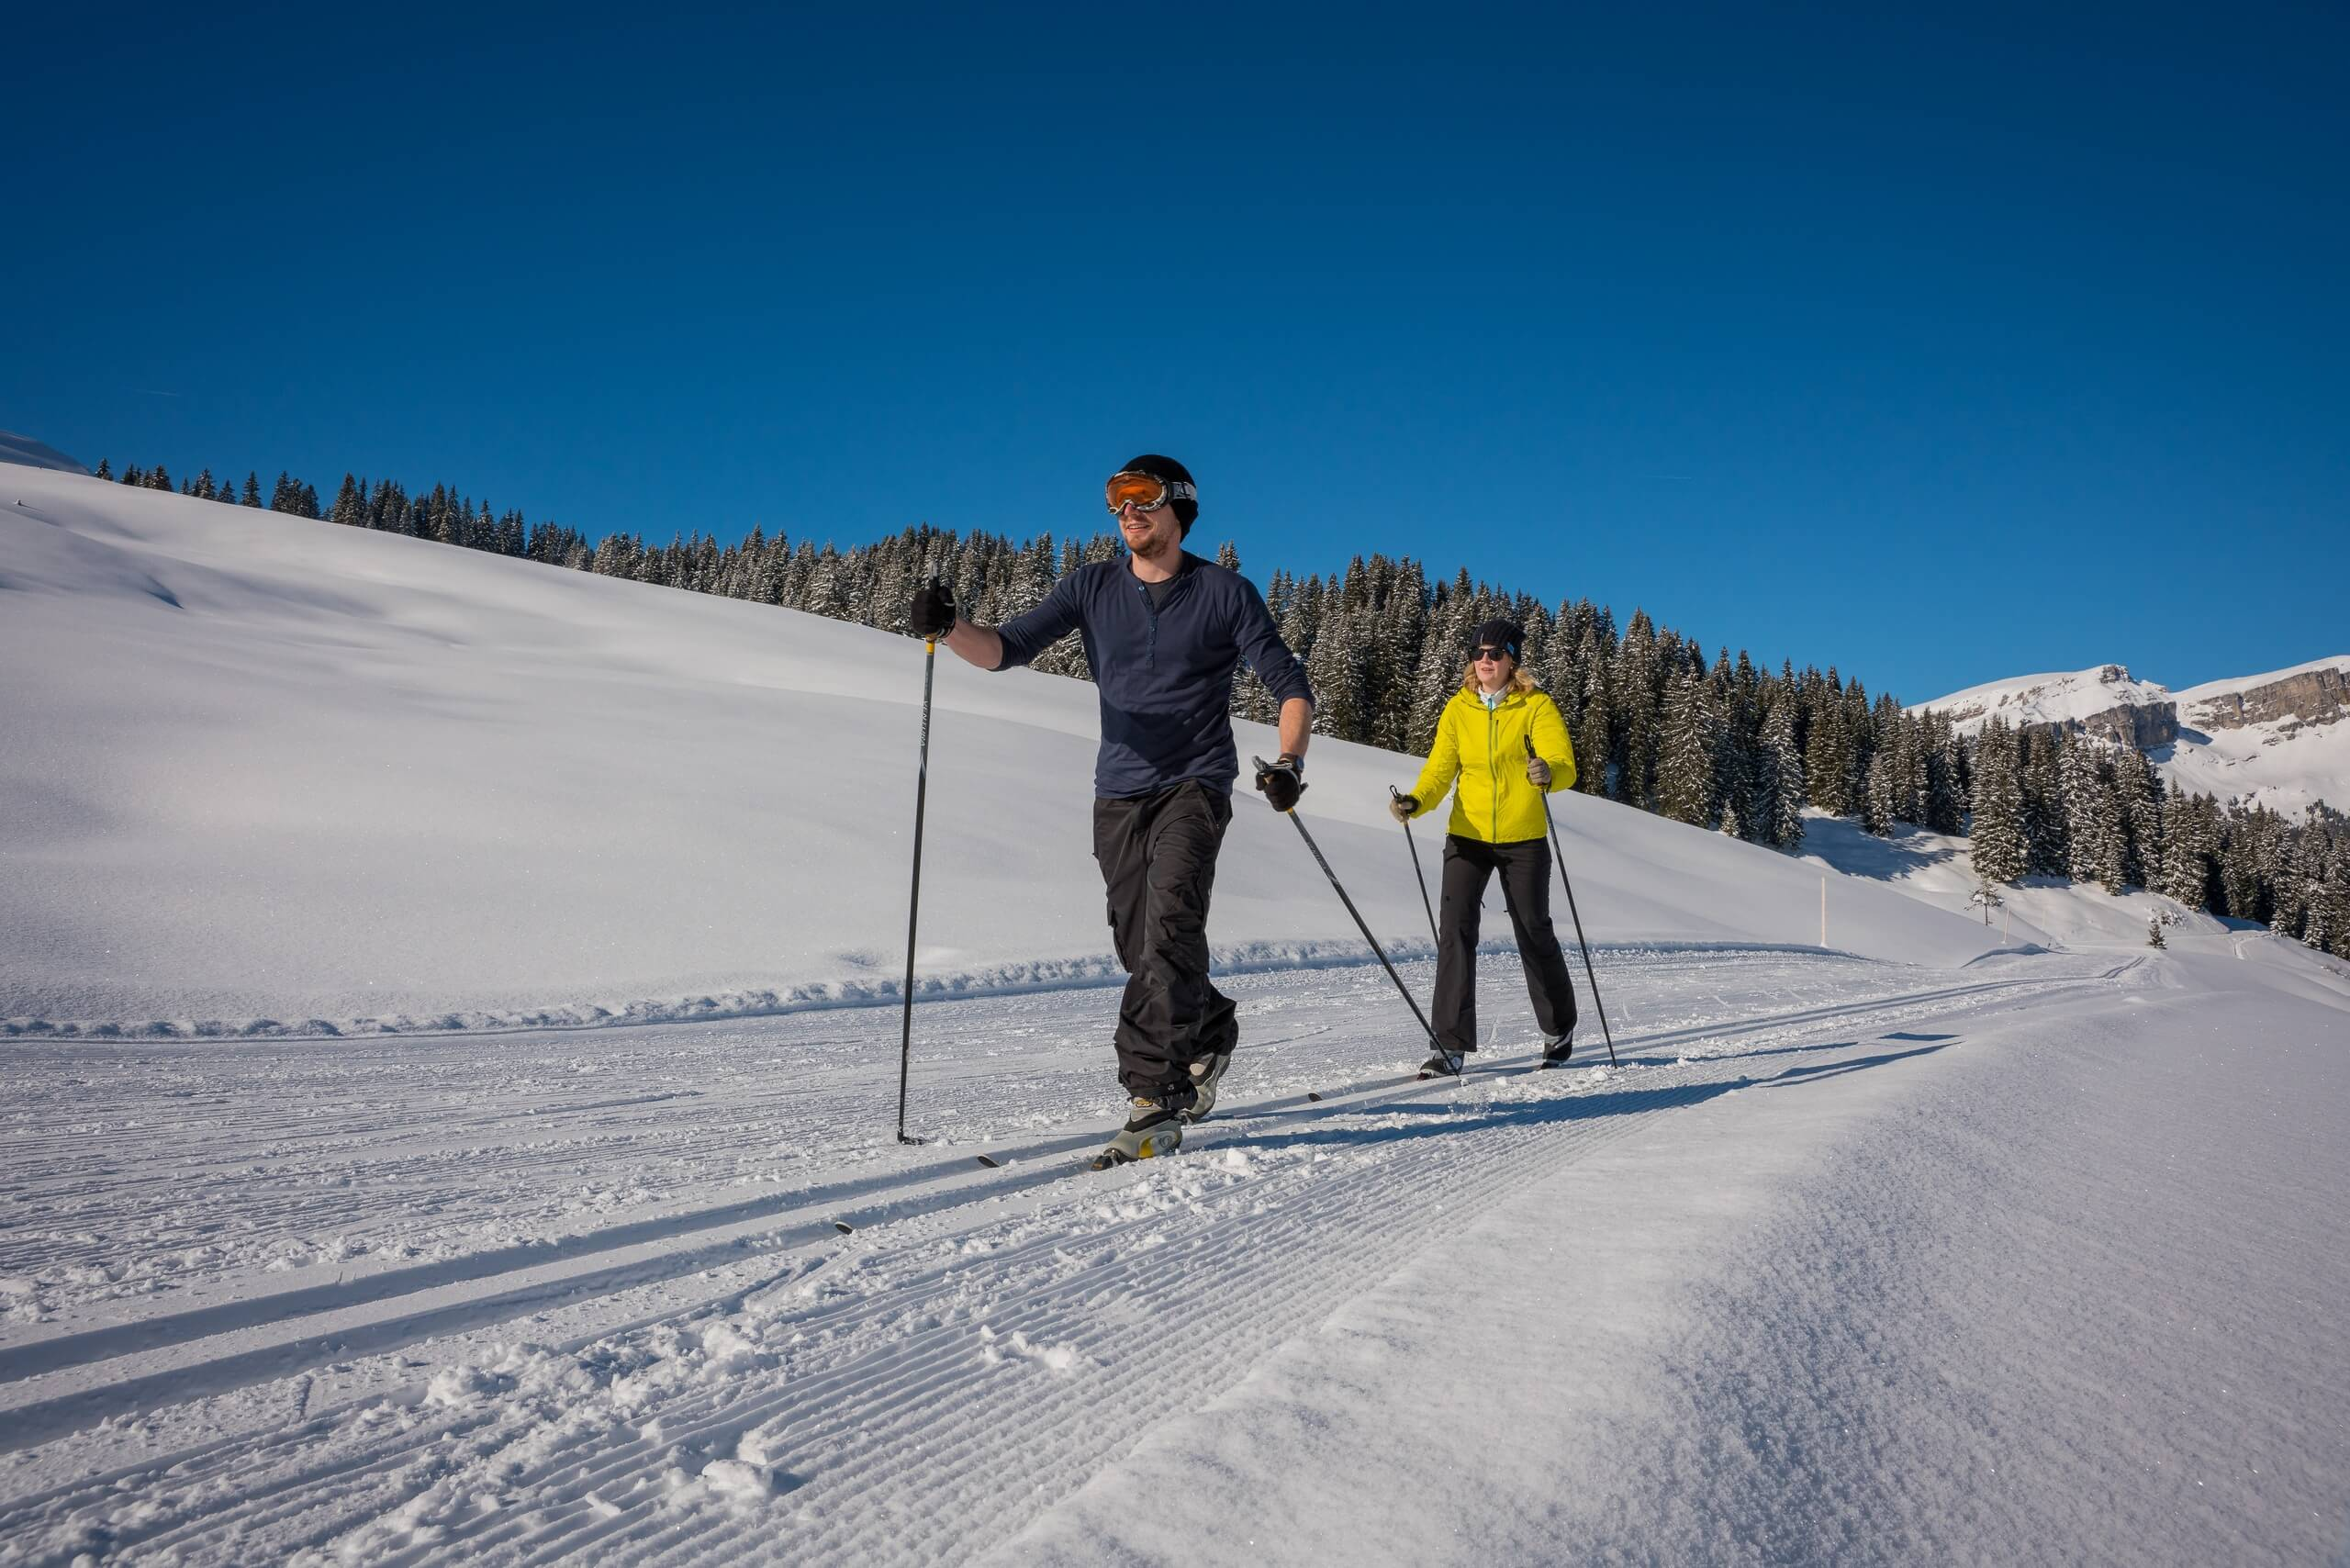 lombachalp-langlauf-winter-winteraktivitaet